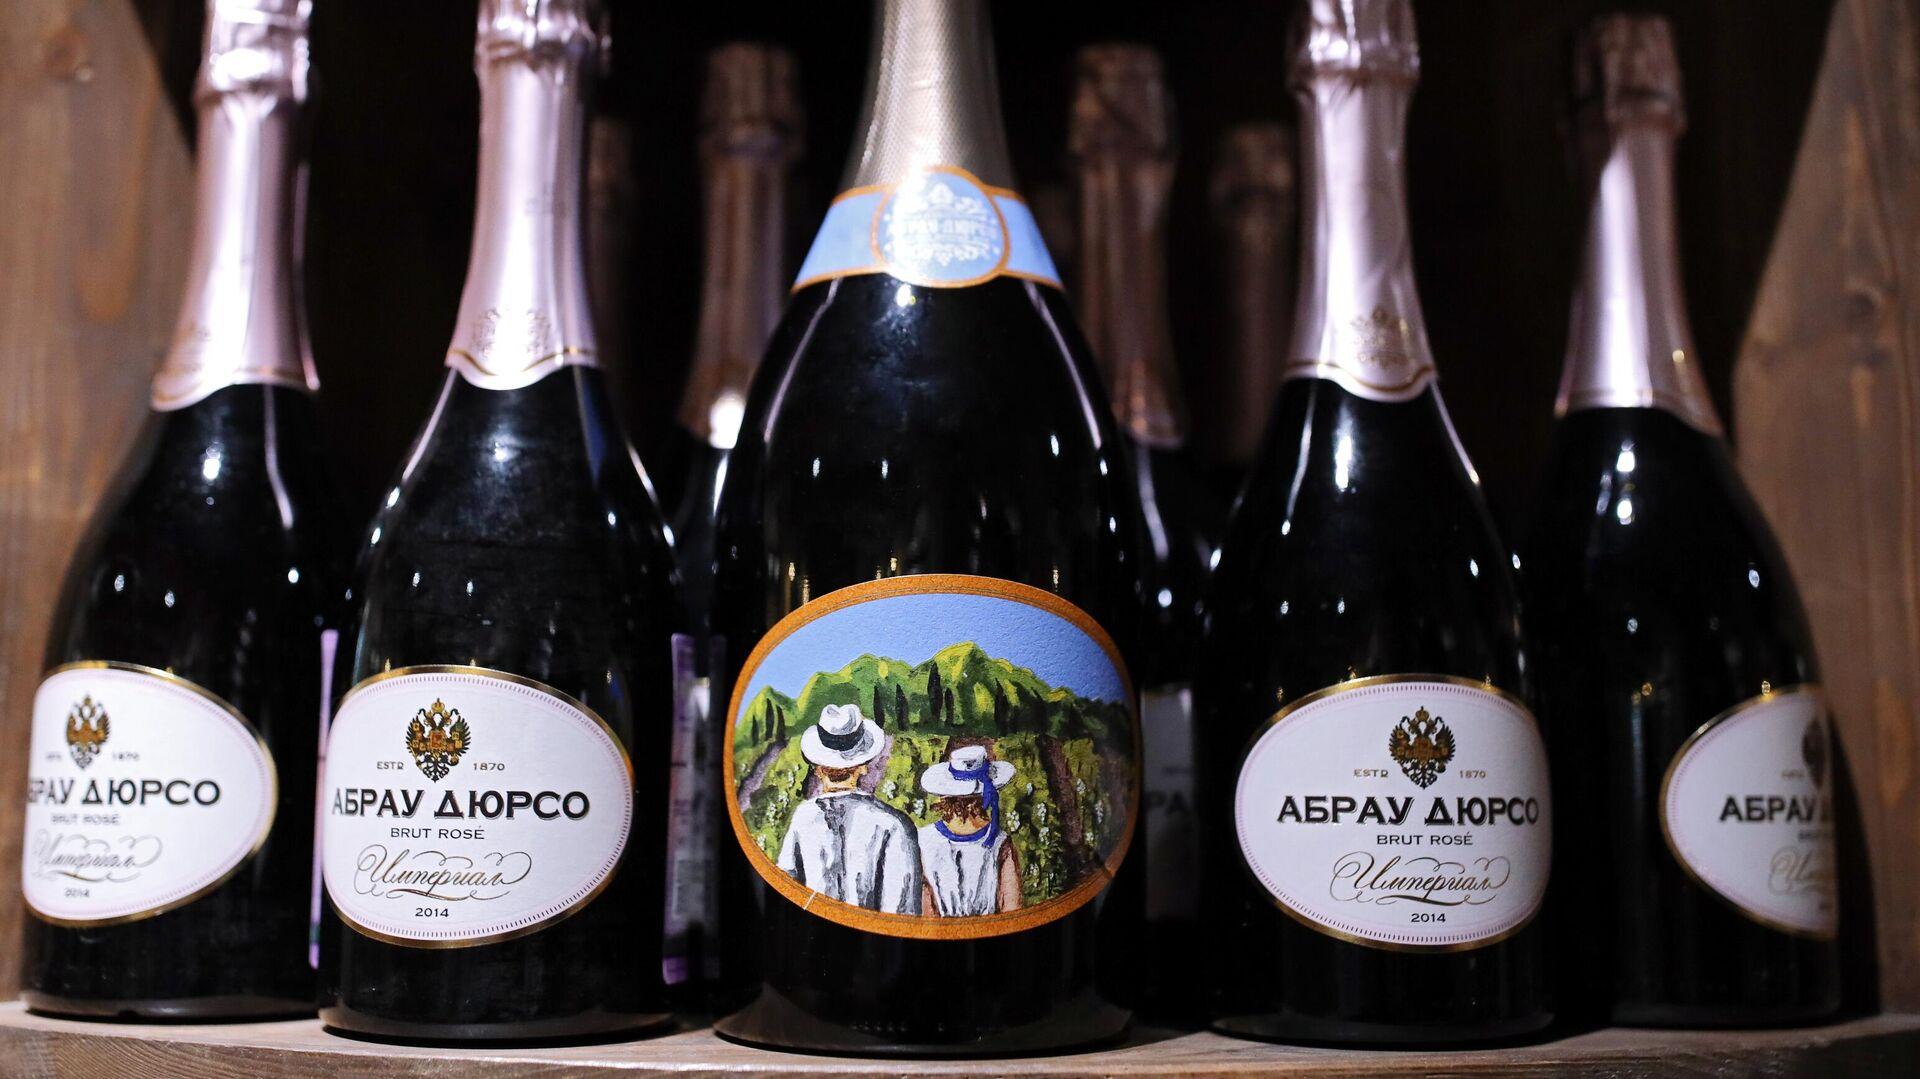 Botellas del espumante ruso Abrau-Durso - Sputnik Mundo, 1920, 20.06.2021